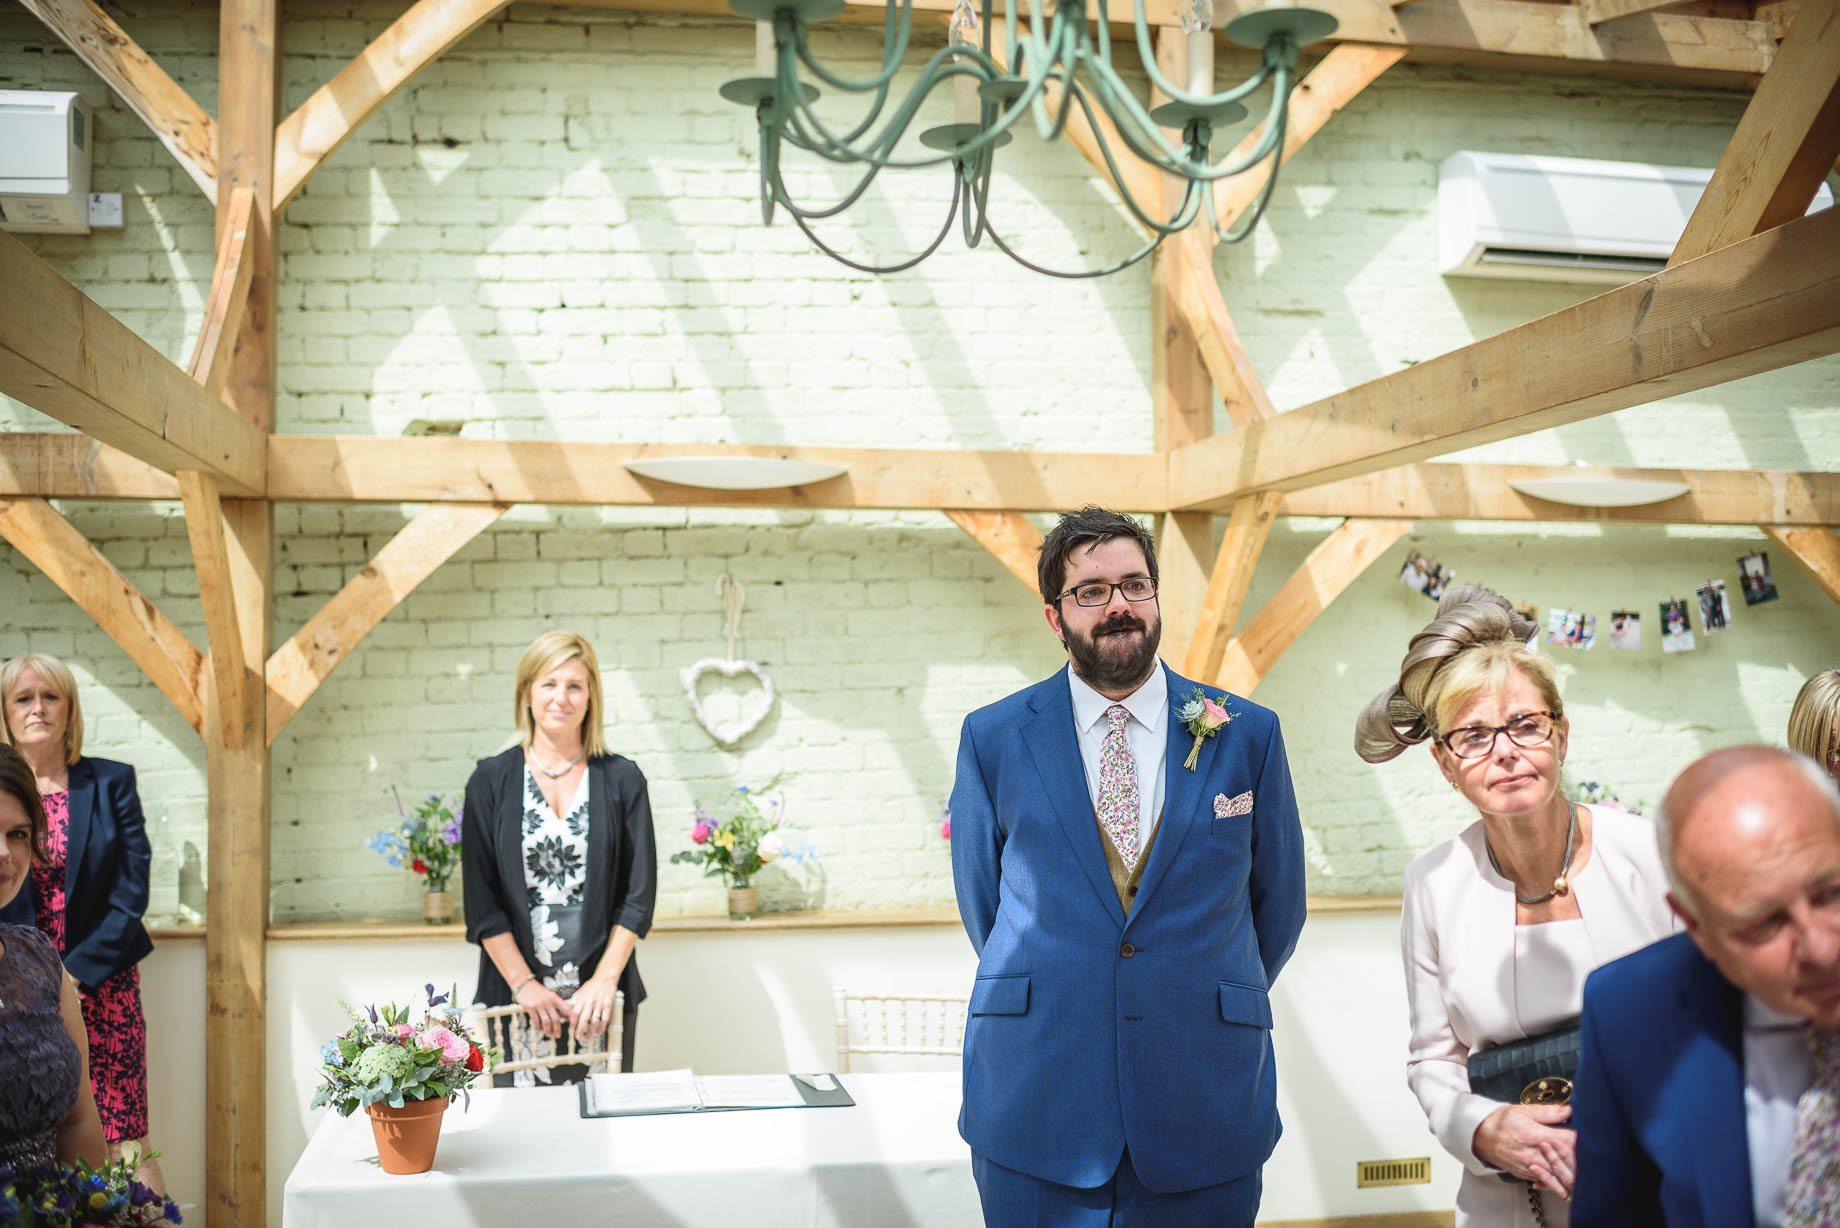 Gaynes Park wedding photography - Guy Collier Photography - Rachel and Jon (64 of 169)